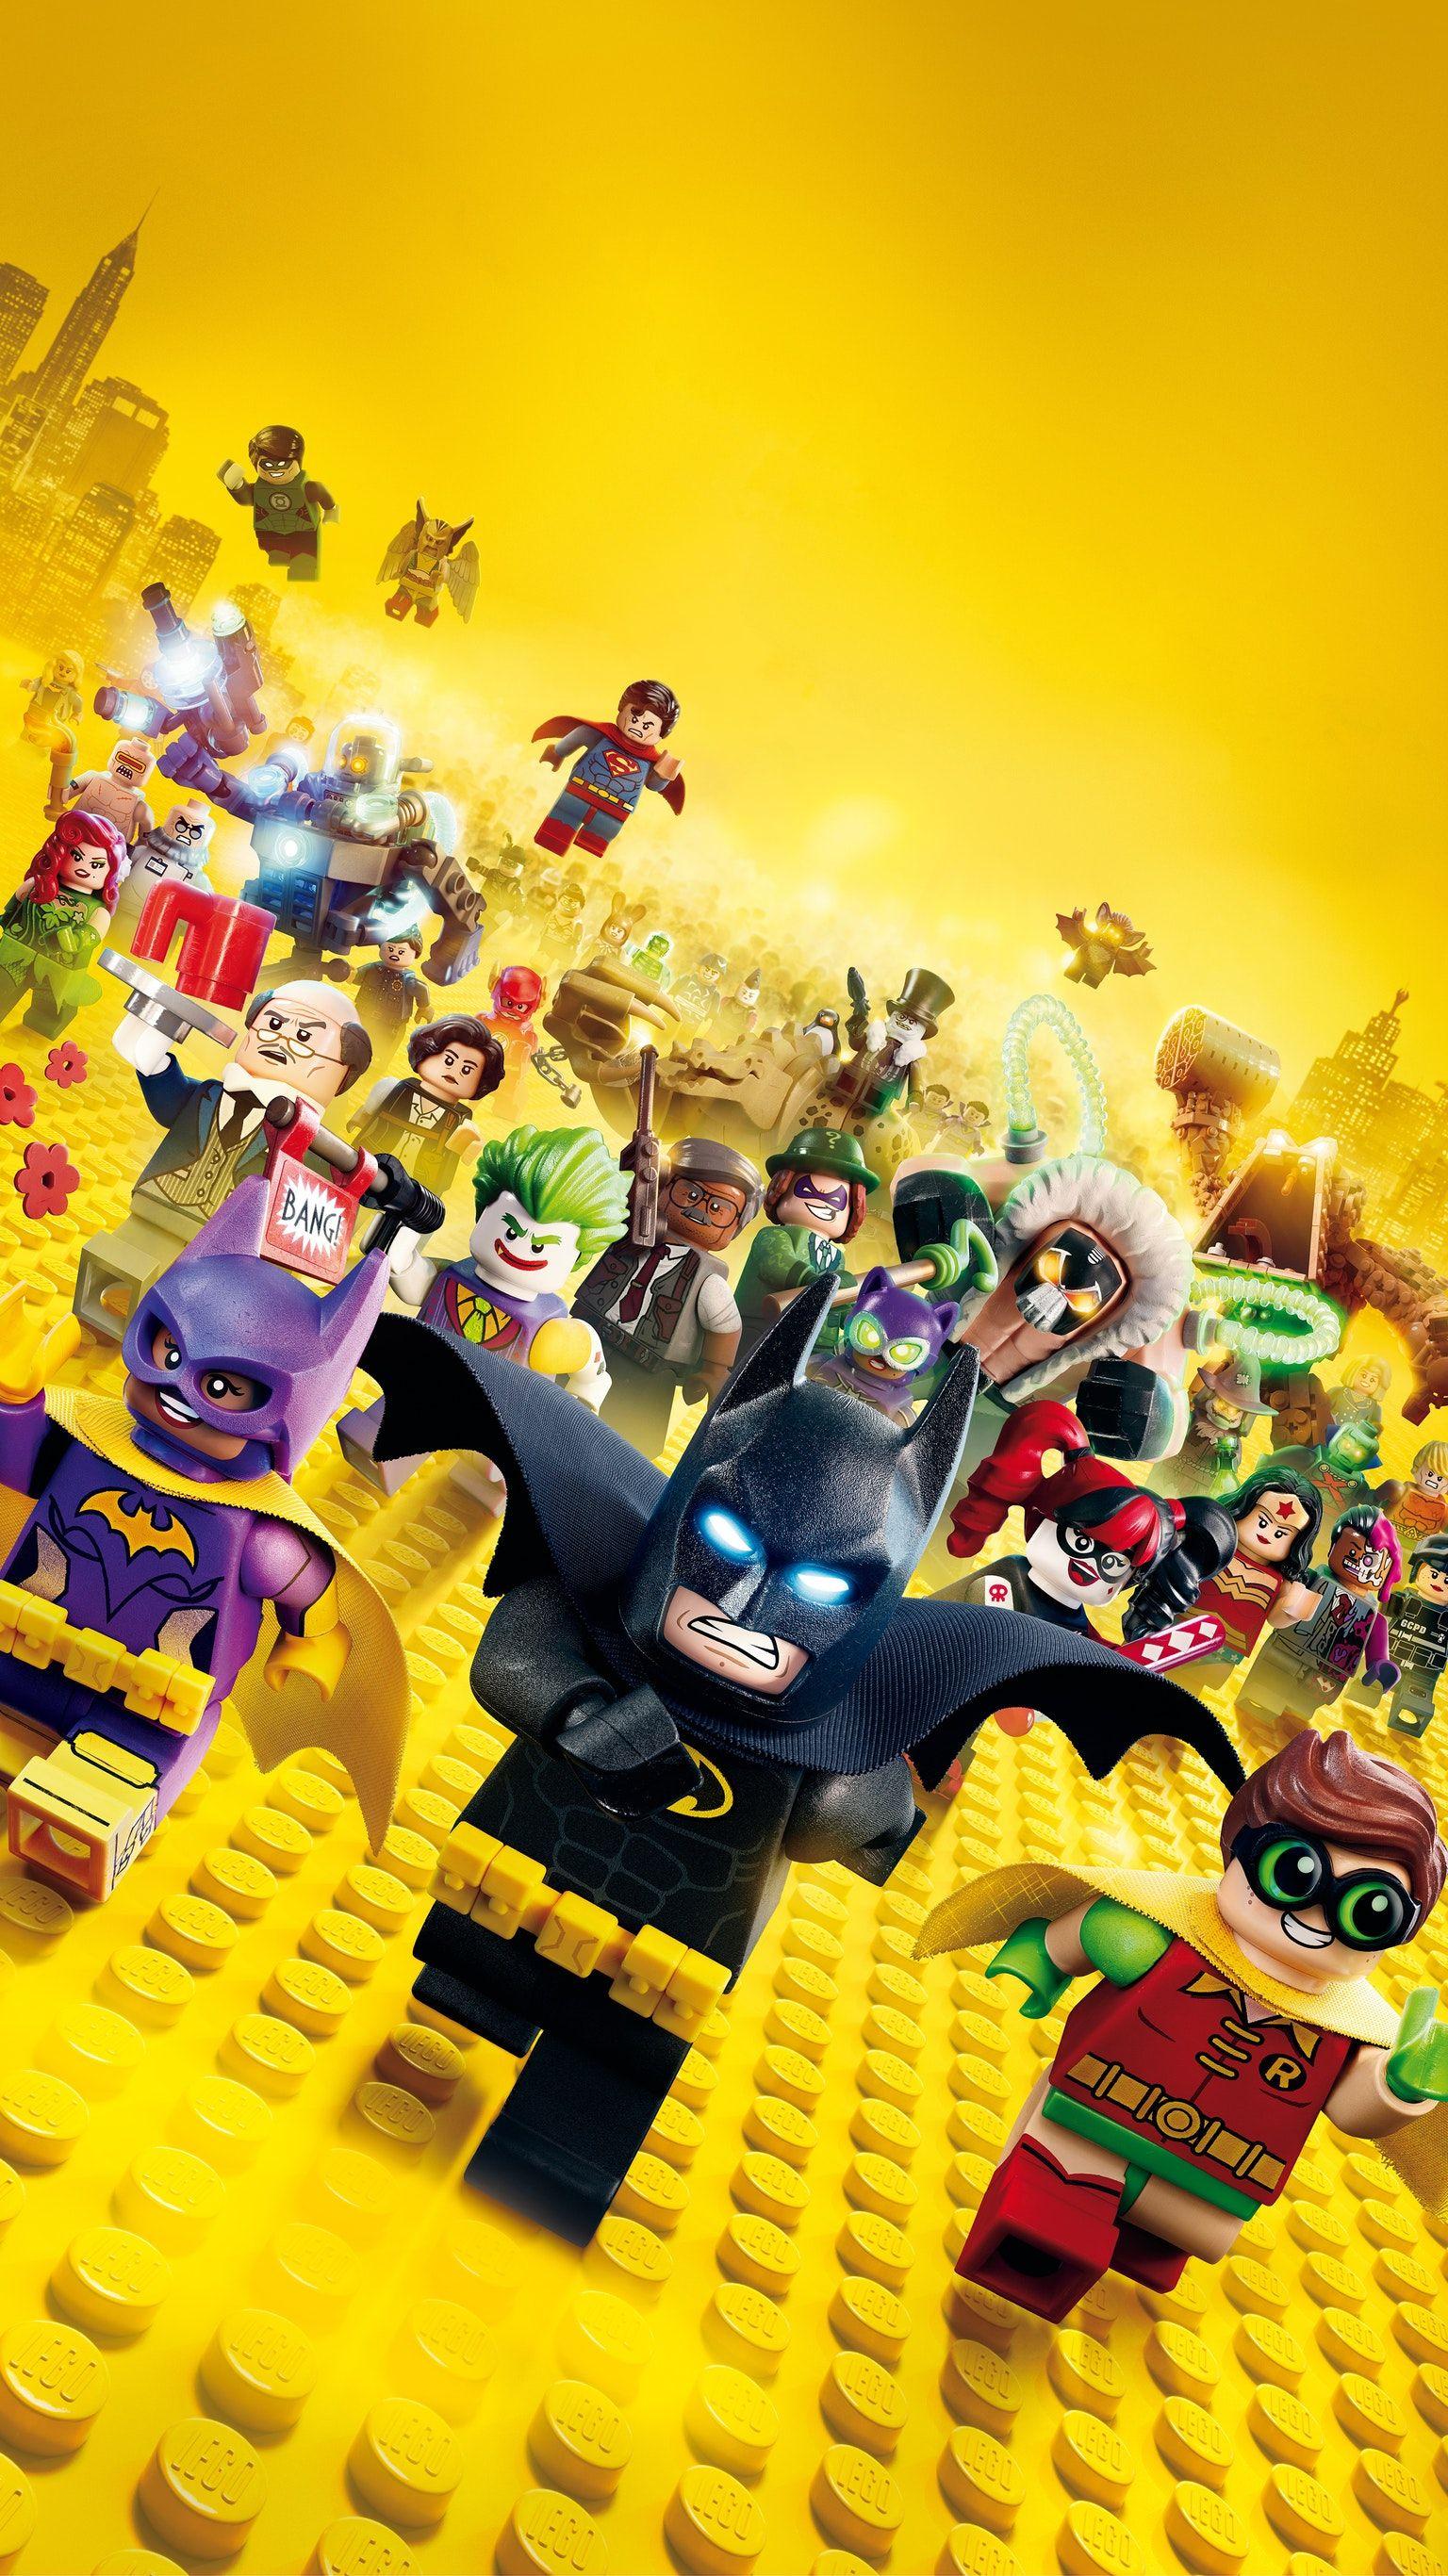 The Lego Batman Movie 2017 Phone Wallpaper Moviemania Lego Batman Movie Lego Batman Batman Movie Posters